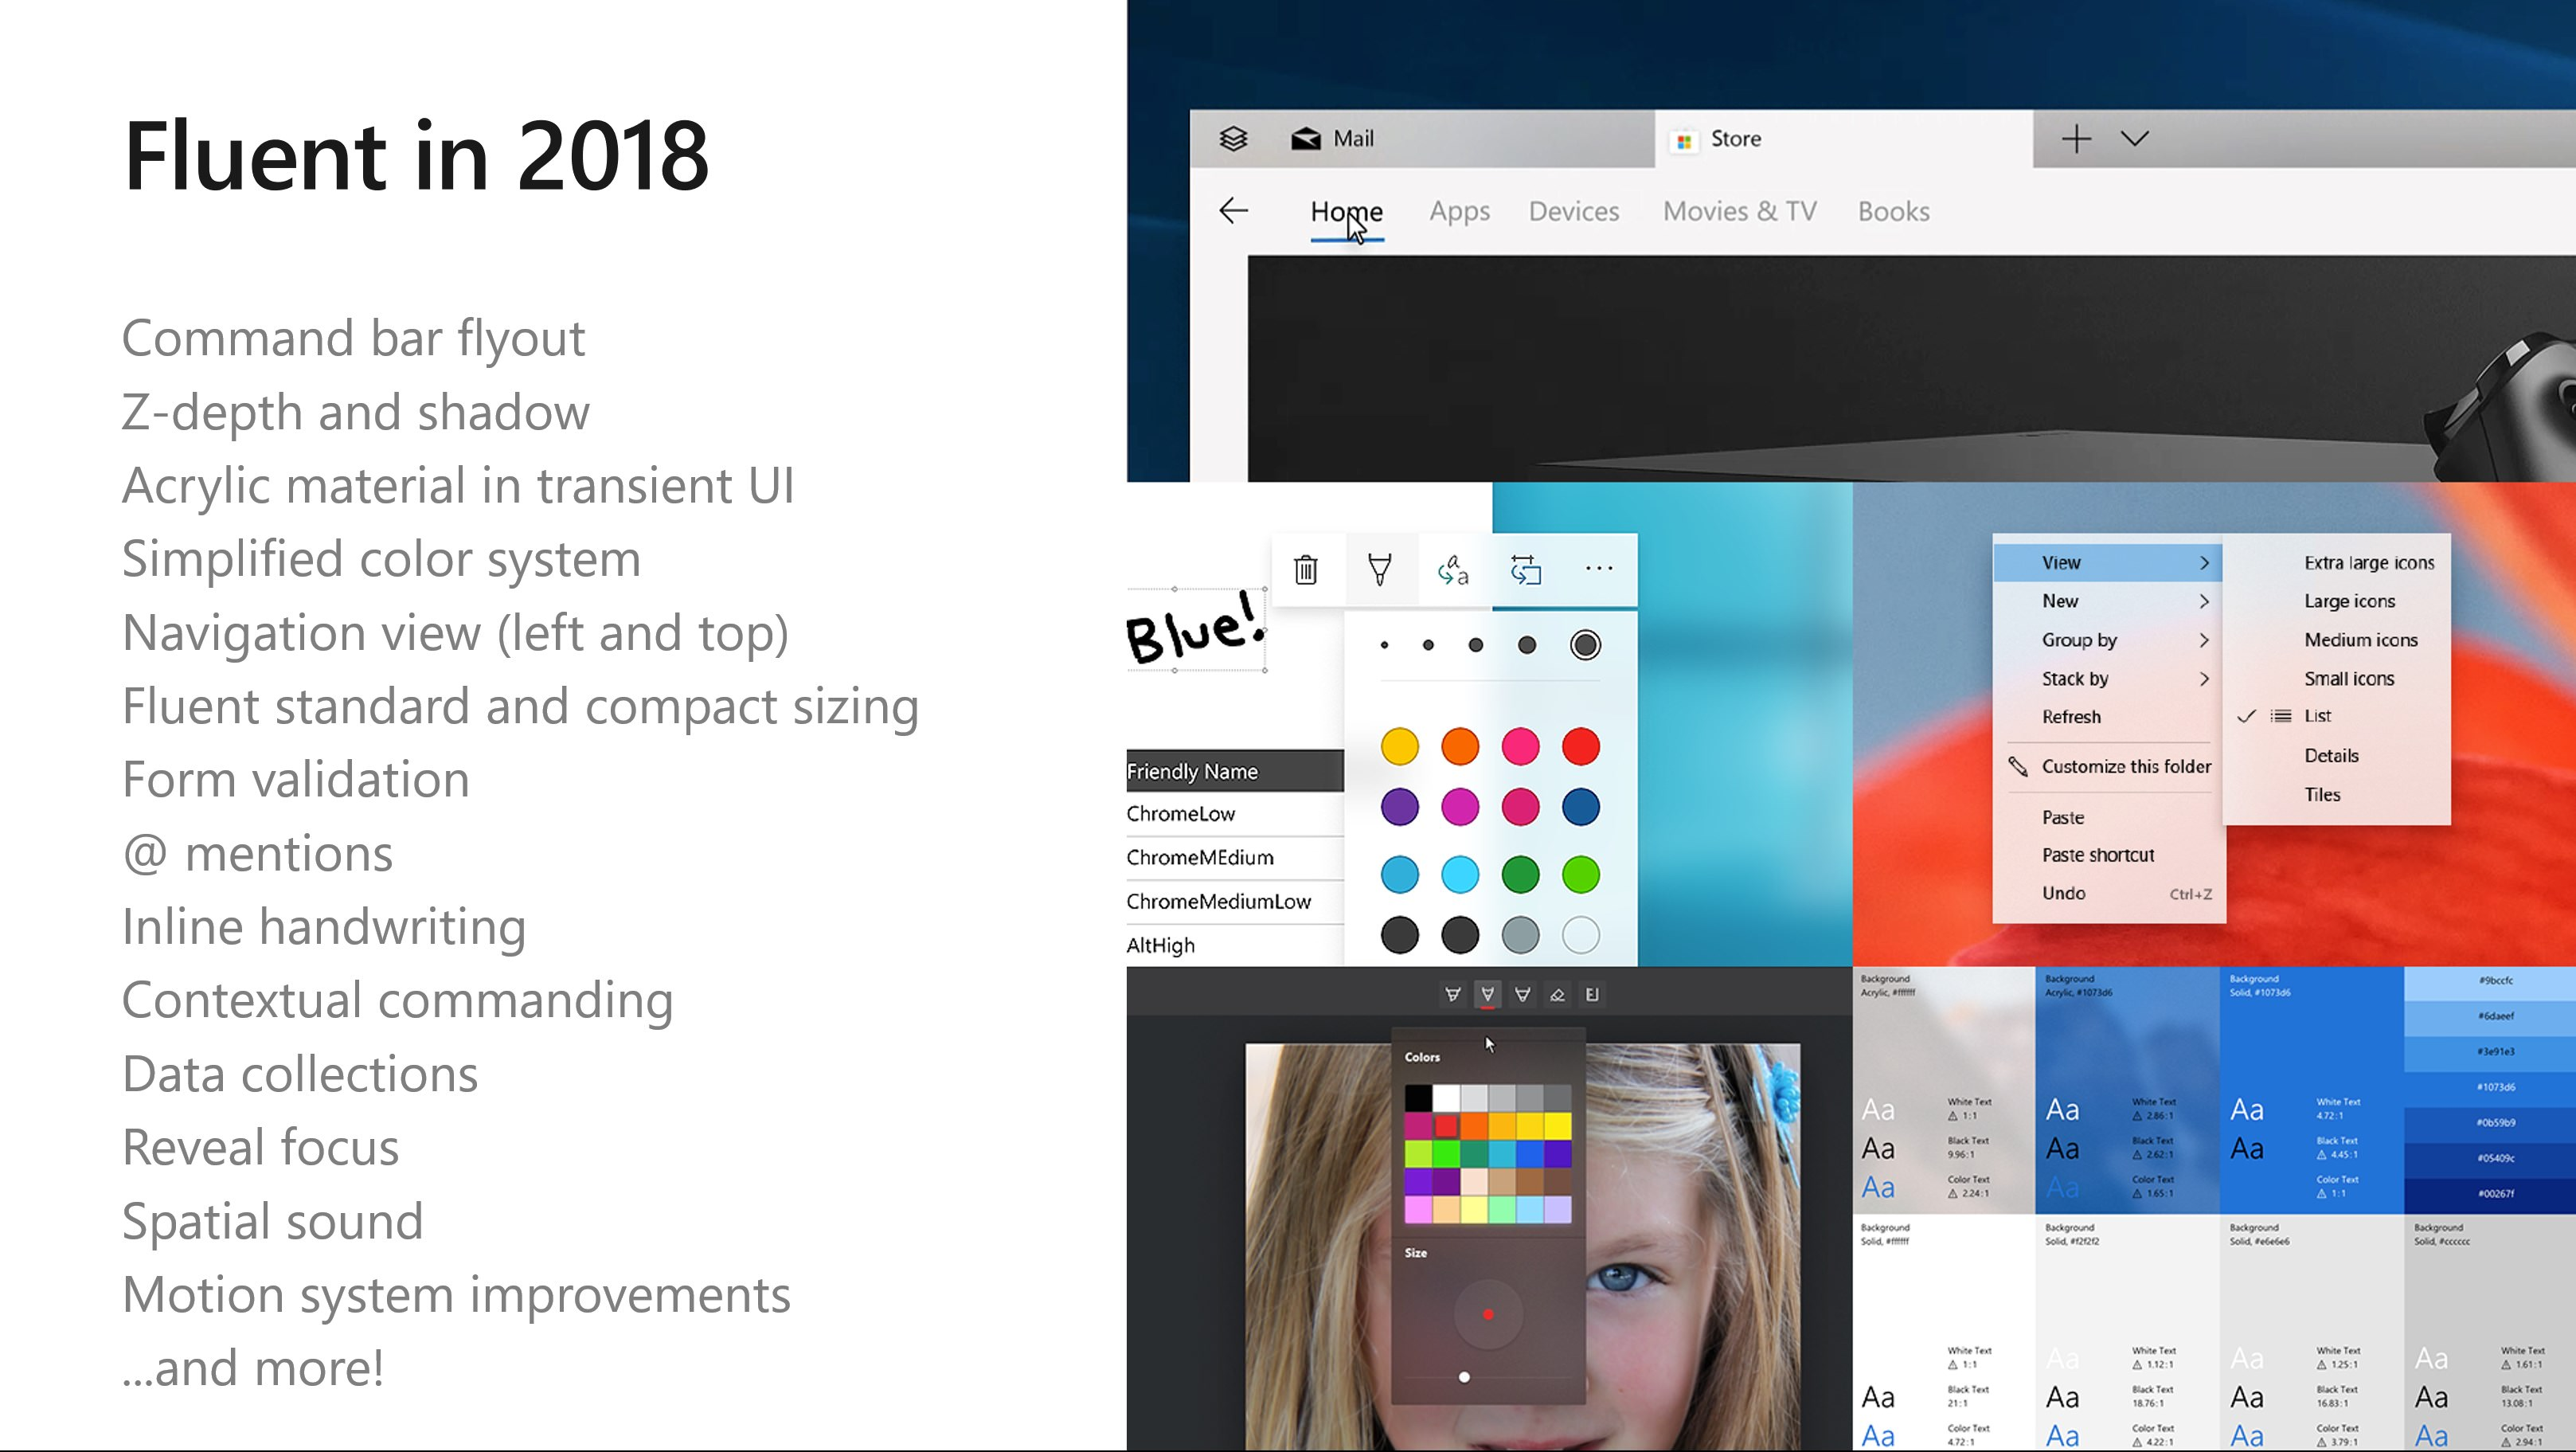 Windows 10 NOUL DESIGN Prezentat Microsoft 2